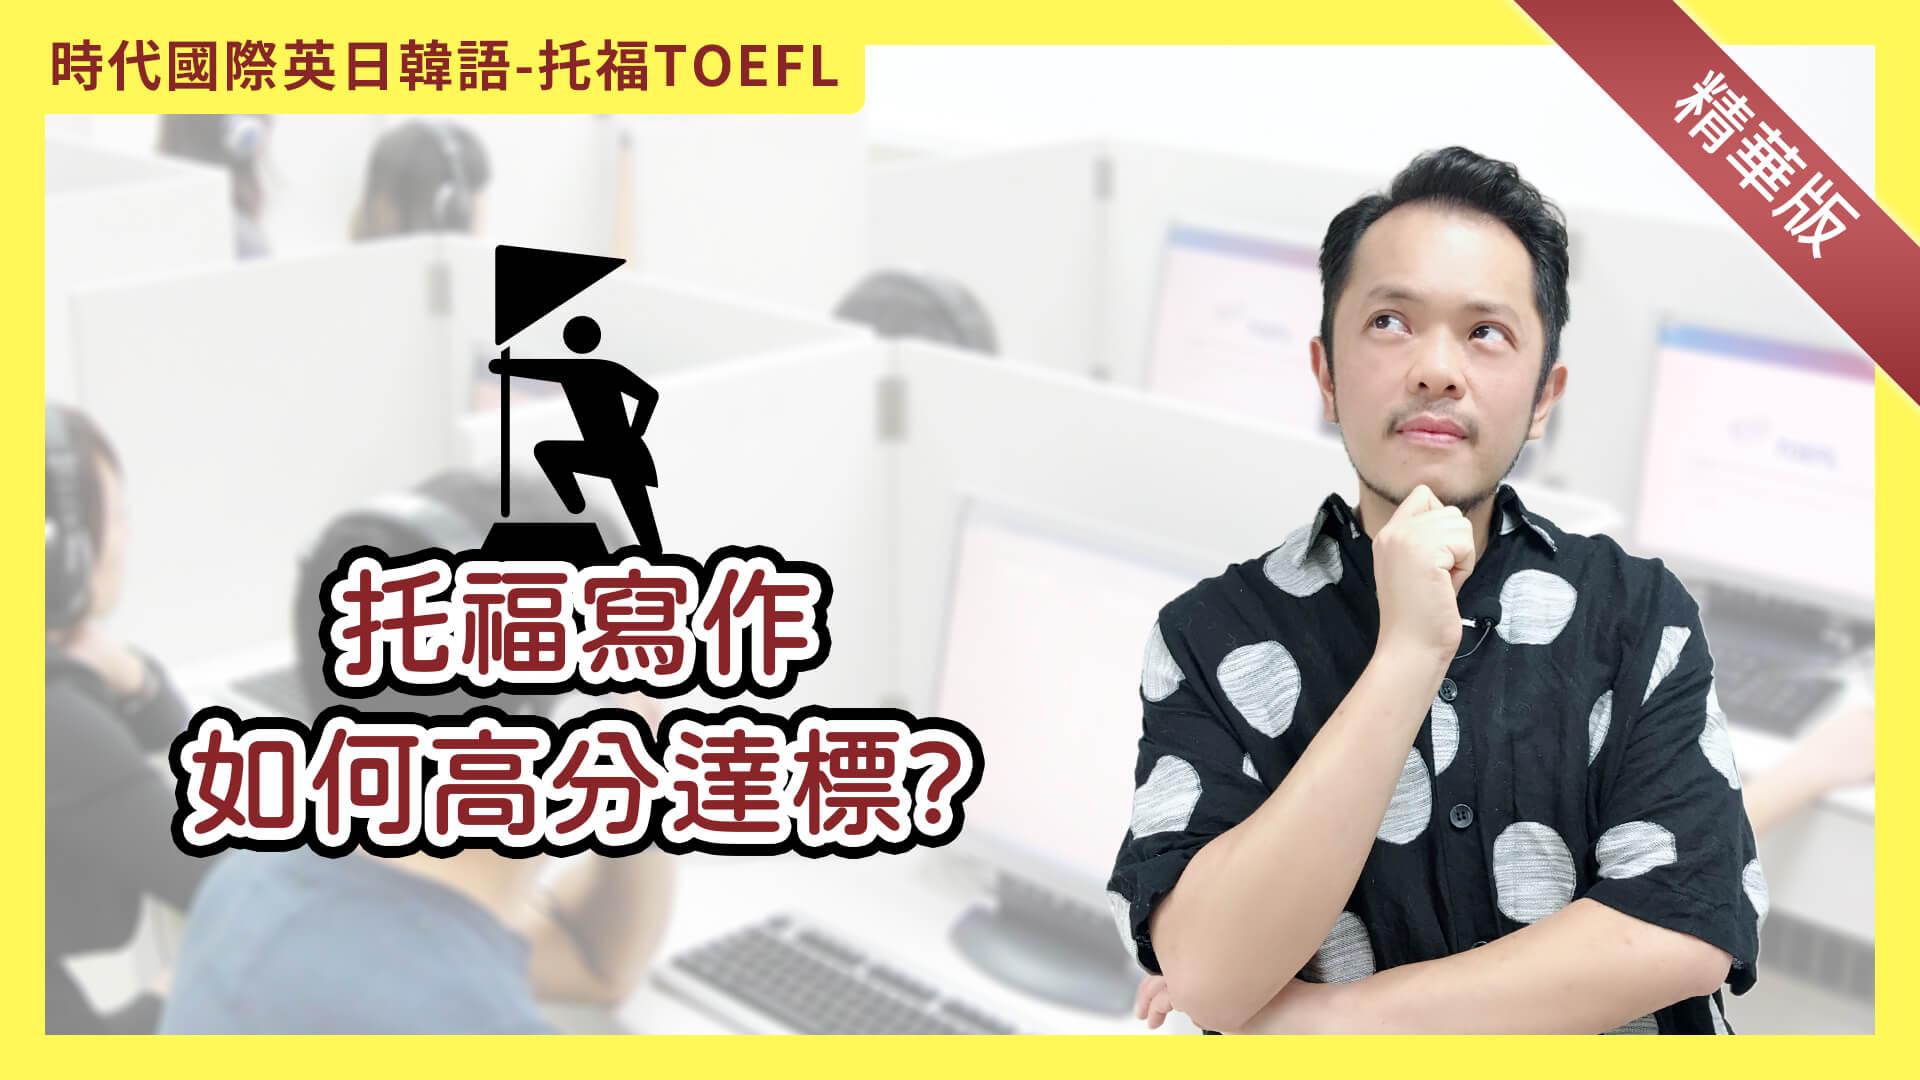 TOEFL托福寫作如何高分達標?